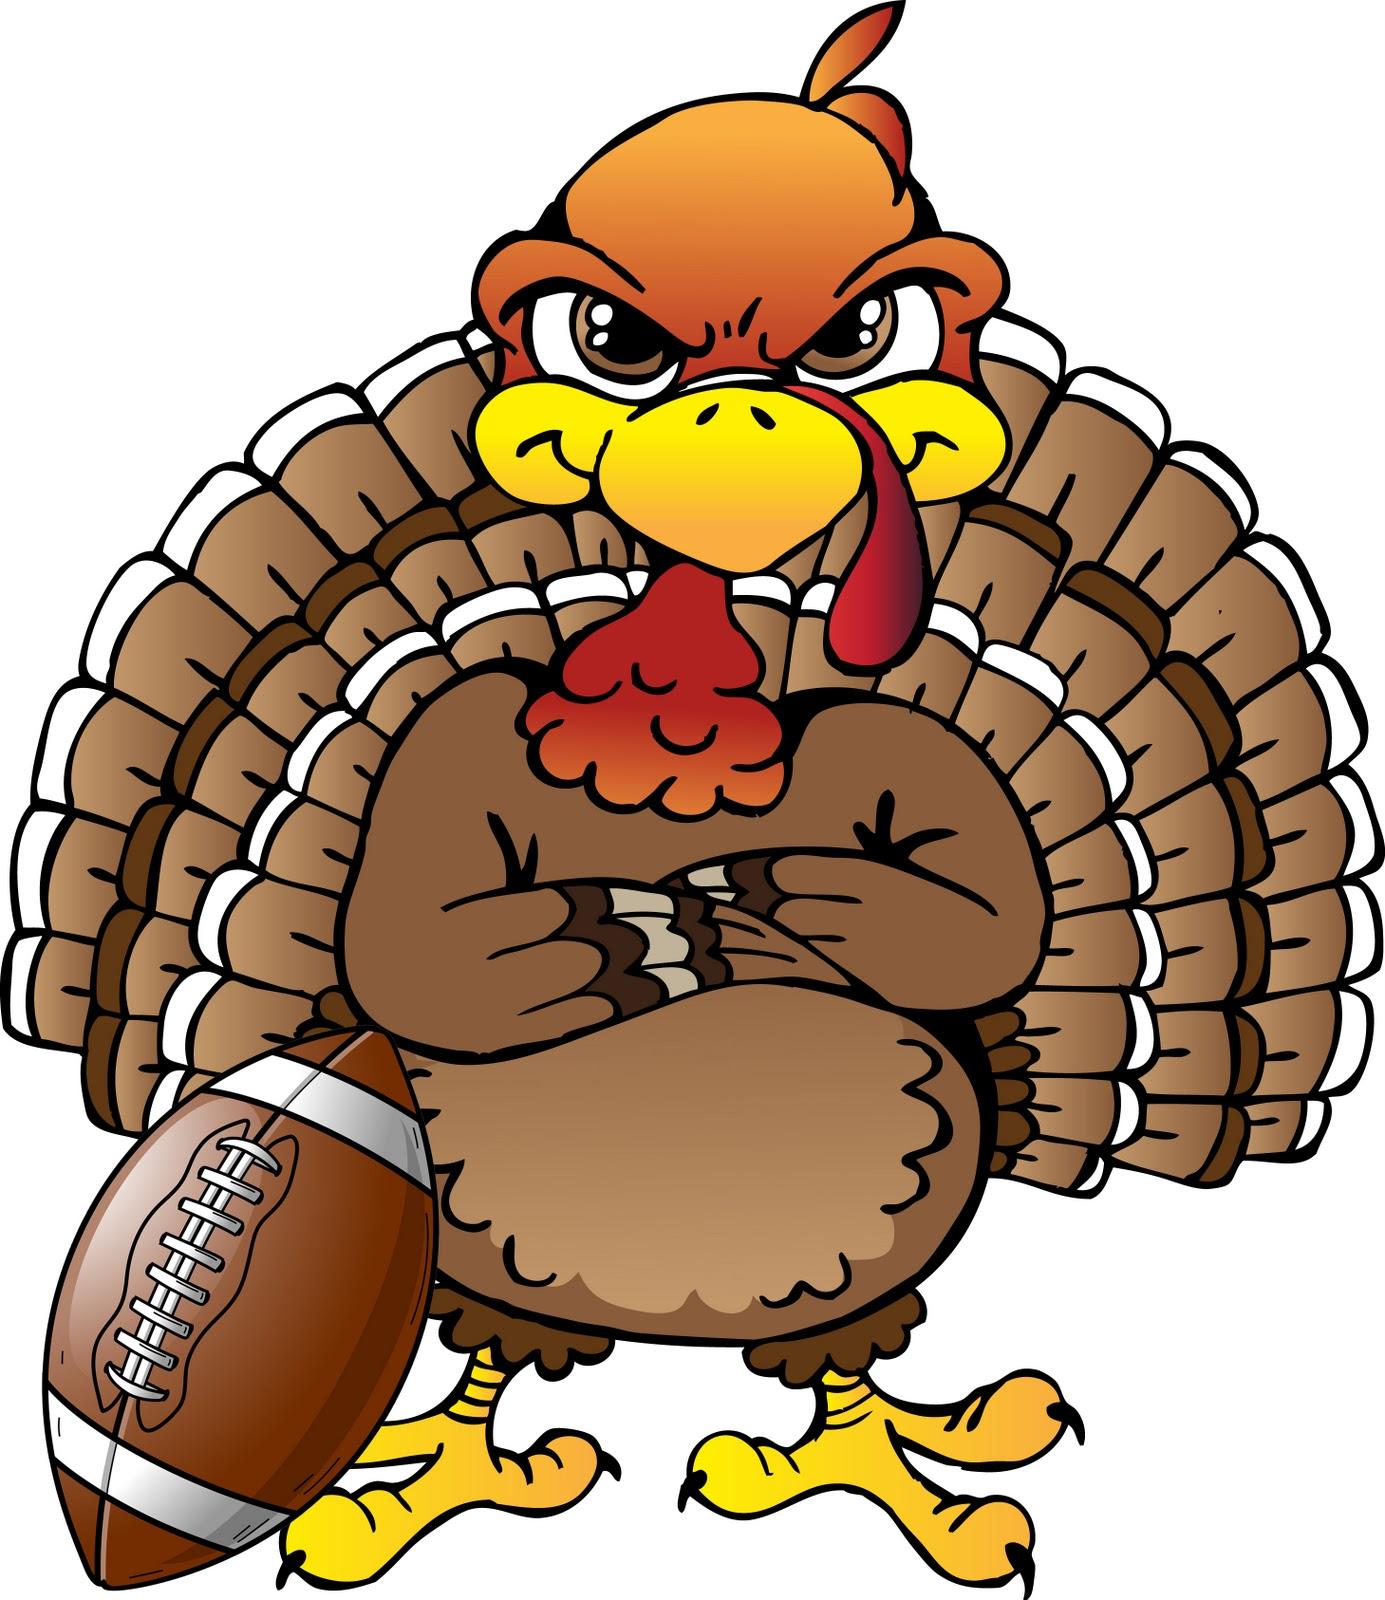 Funny Turkey Clip Art | Funny Thanksgivi-Funny Turkey Clip Art | Funny Thanksgiving Images, wallpaper, Funny Thanksgiving Images hd ... | Art | Pinterest | Very funny, Thanksgiving and Funny ...-11